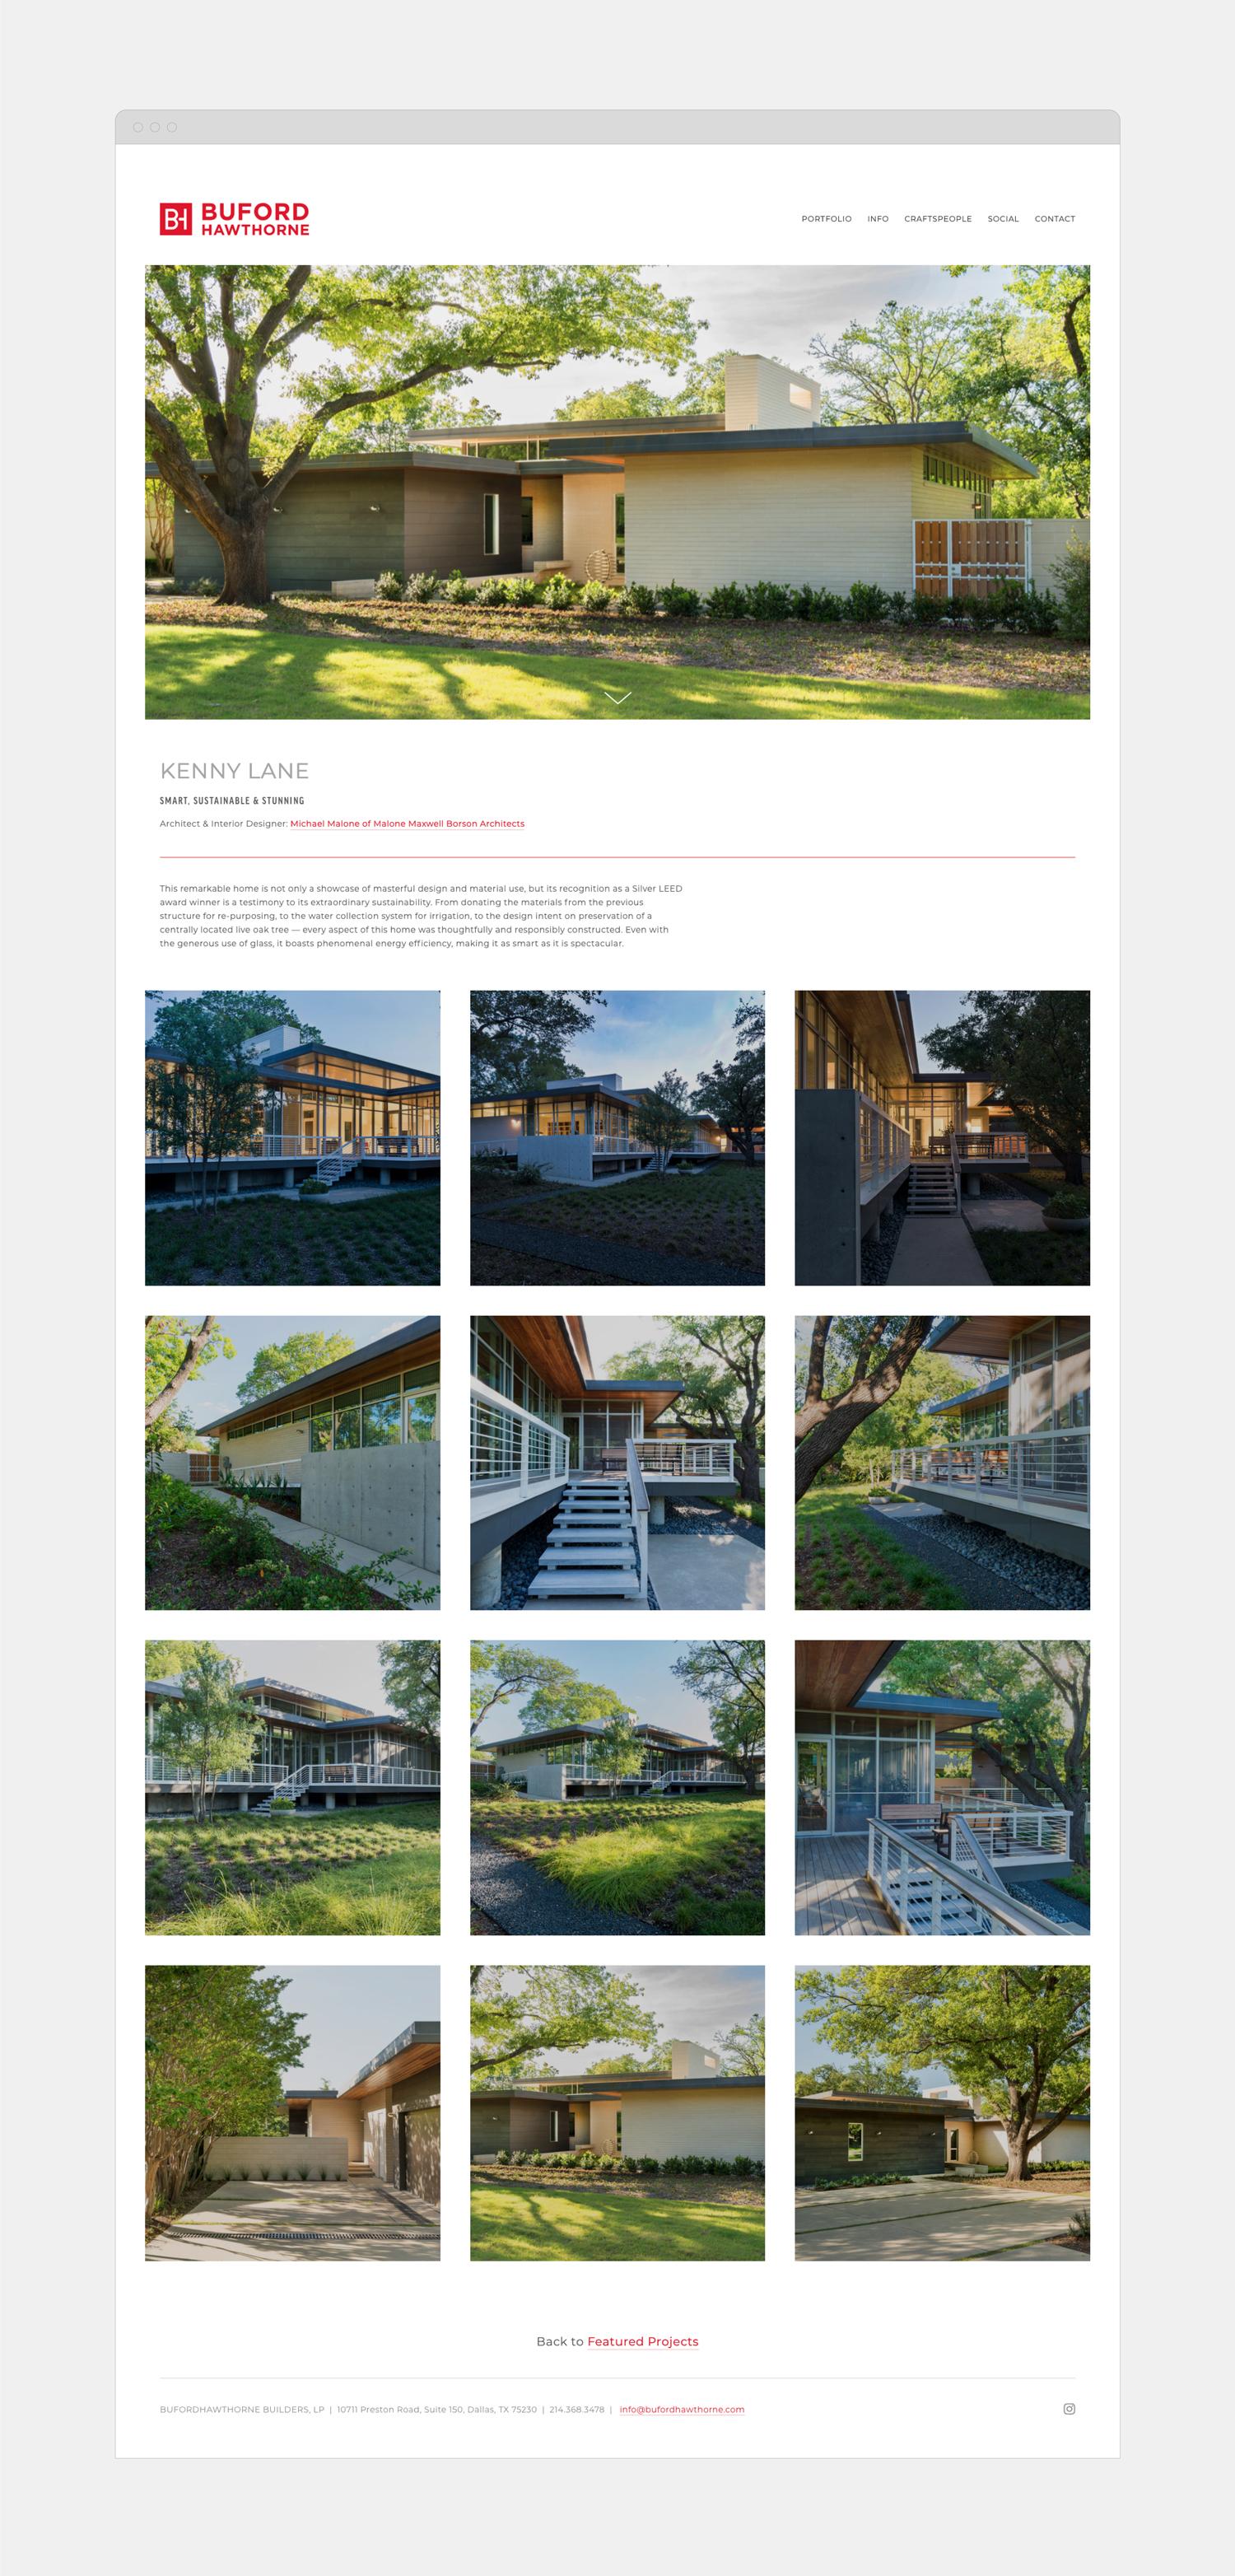 BH_Website1.jpg